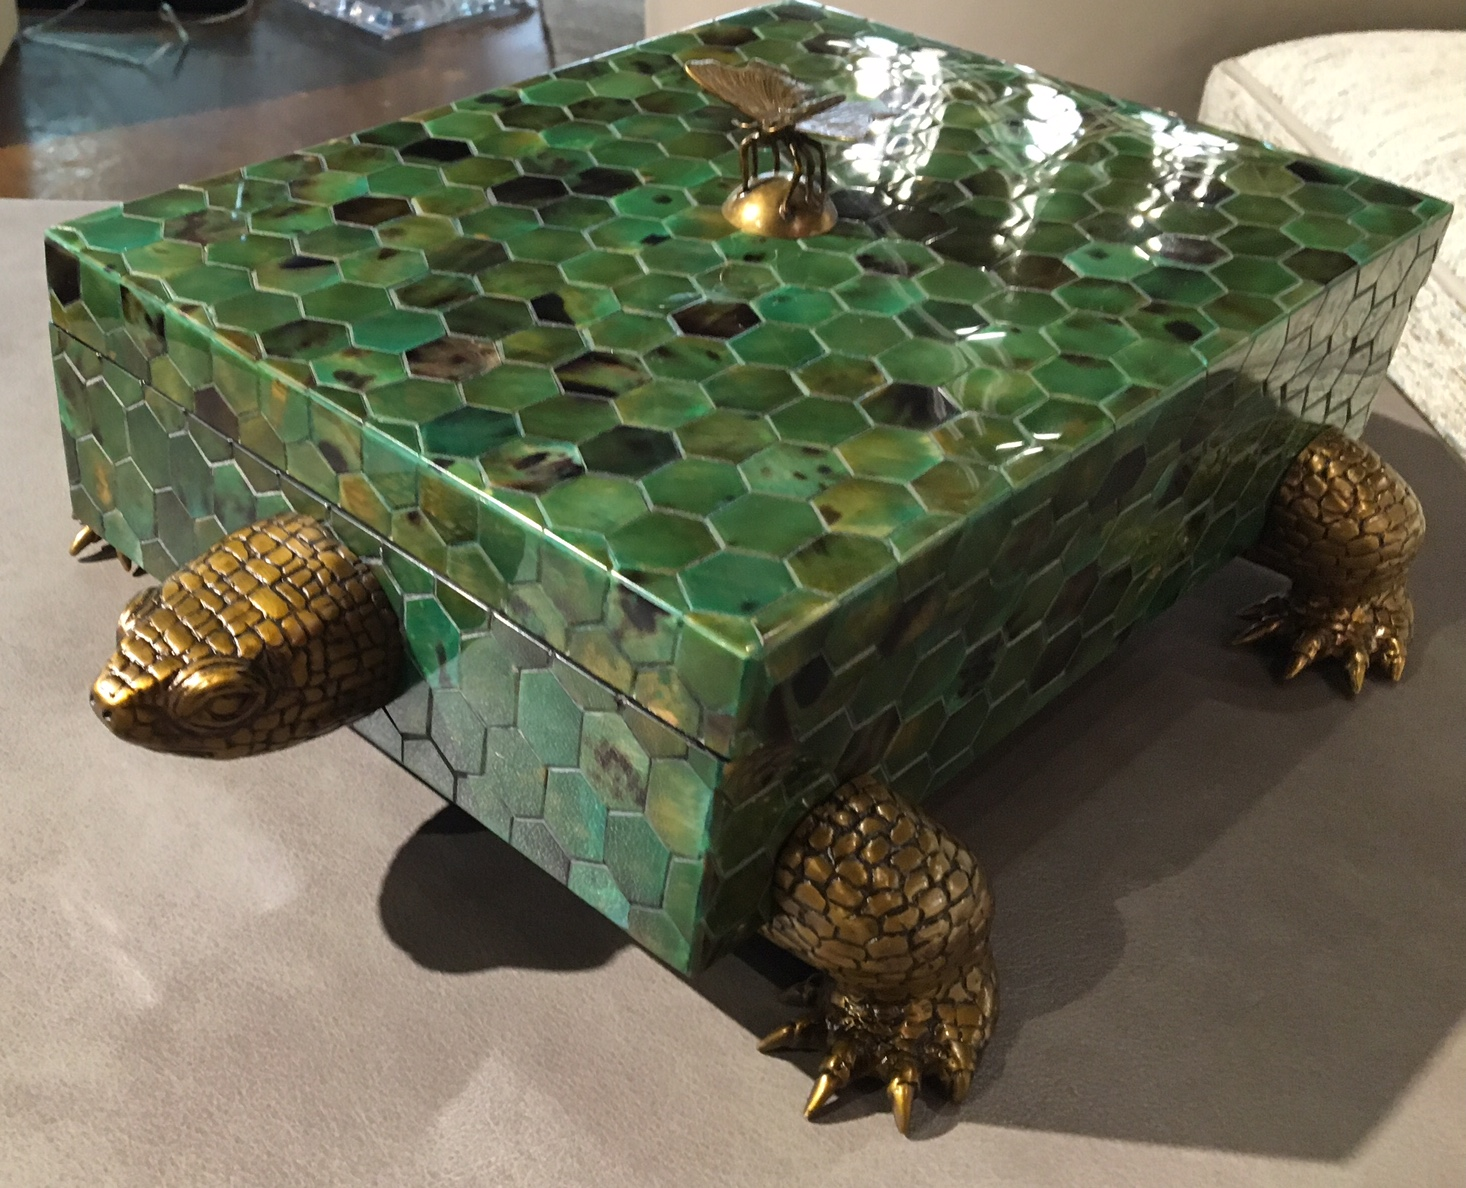 turtlebox